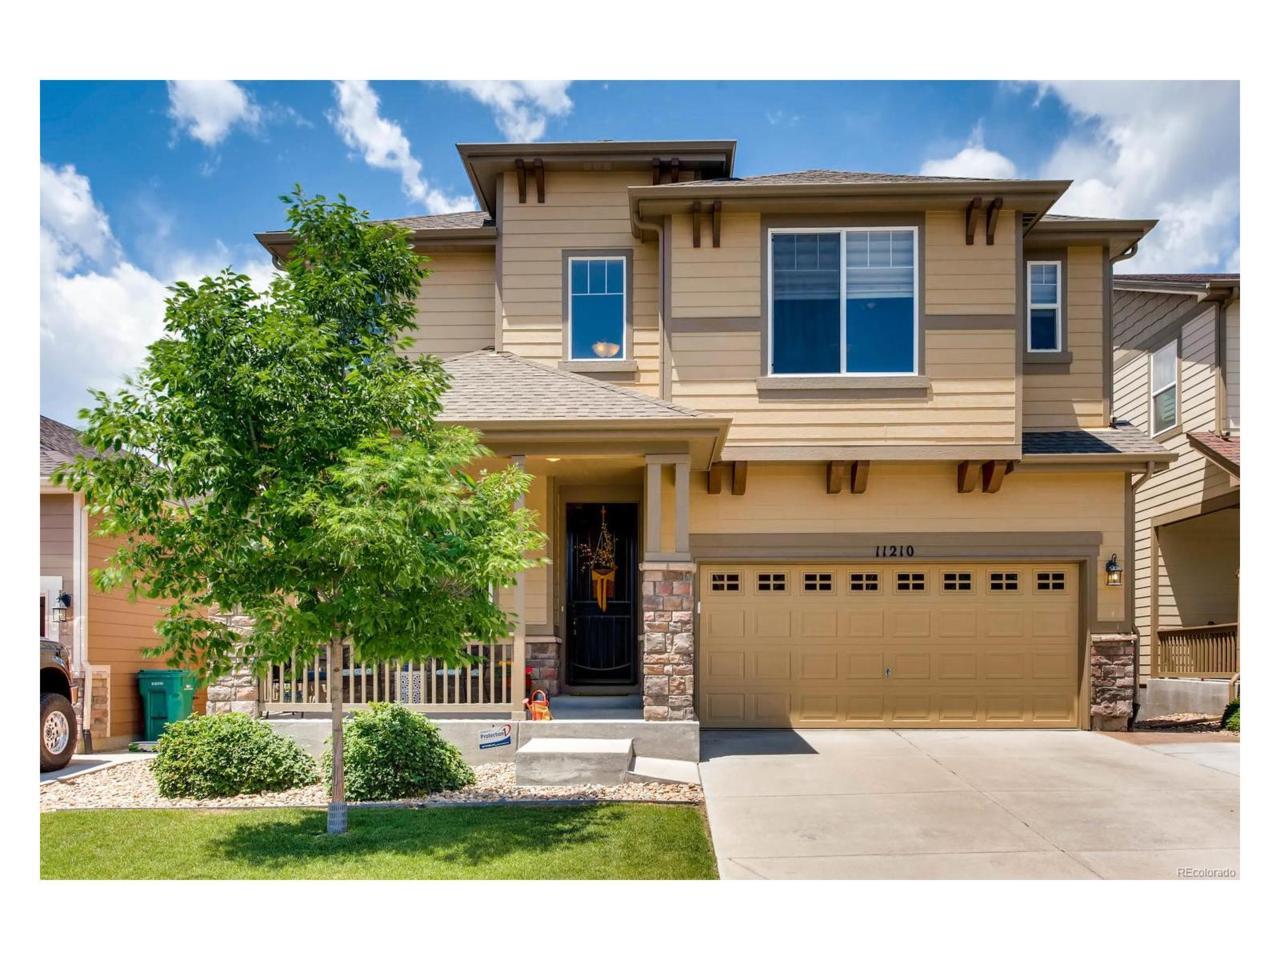 11210 W Tanforan Circle, Littleton, CO 80127 (MLS #7689410) :: 8z Real Estate